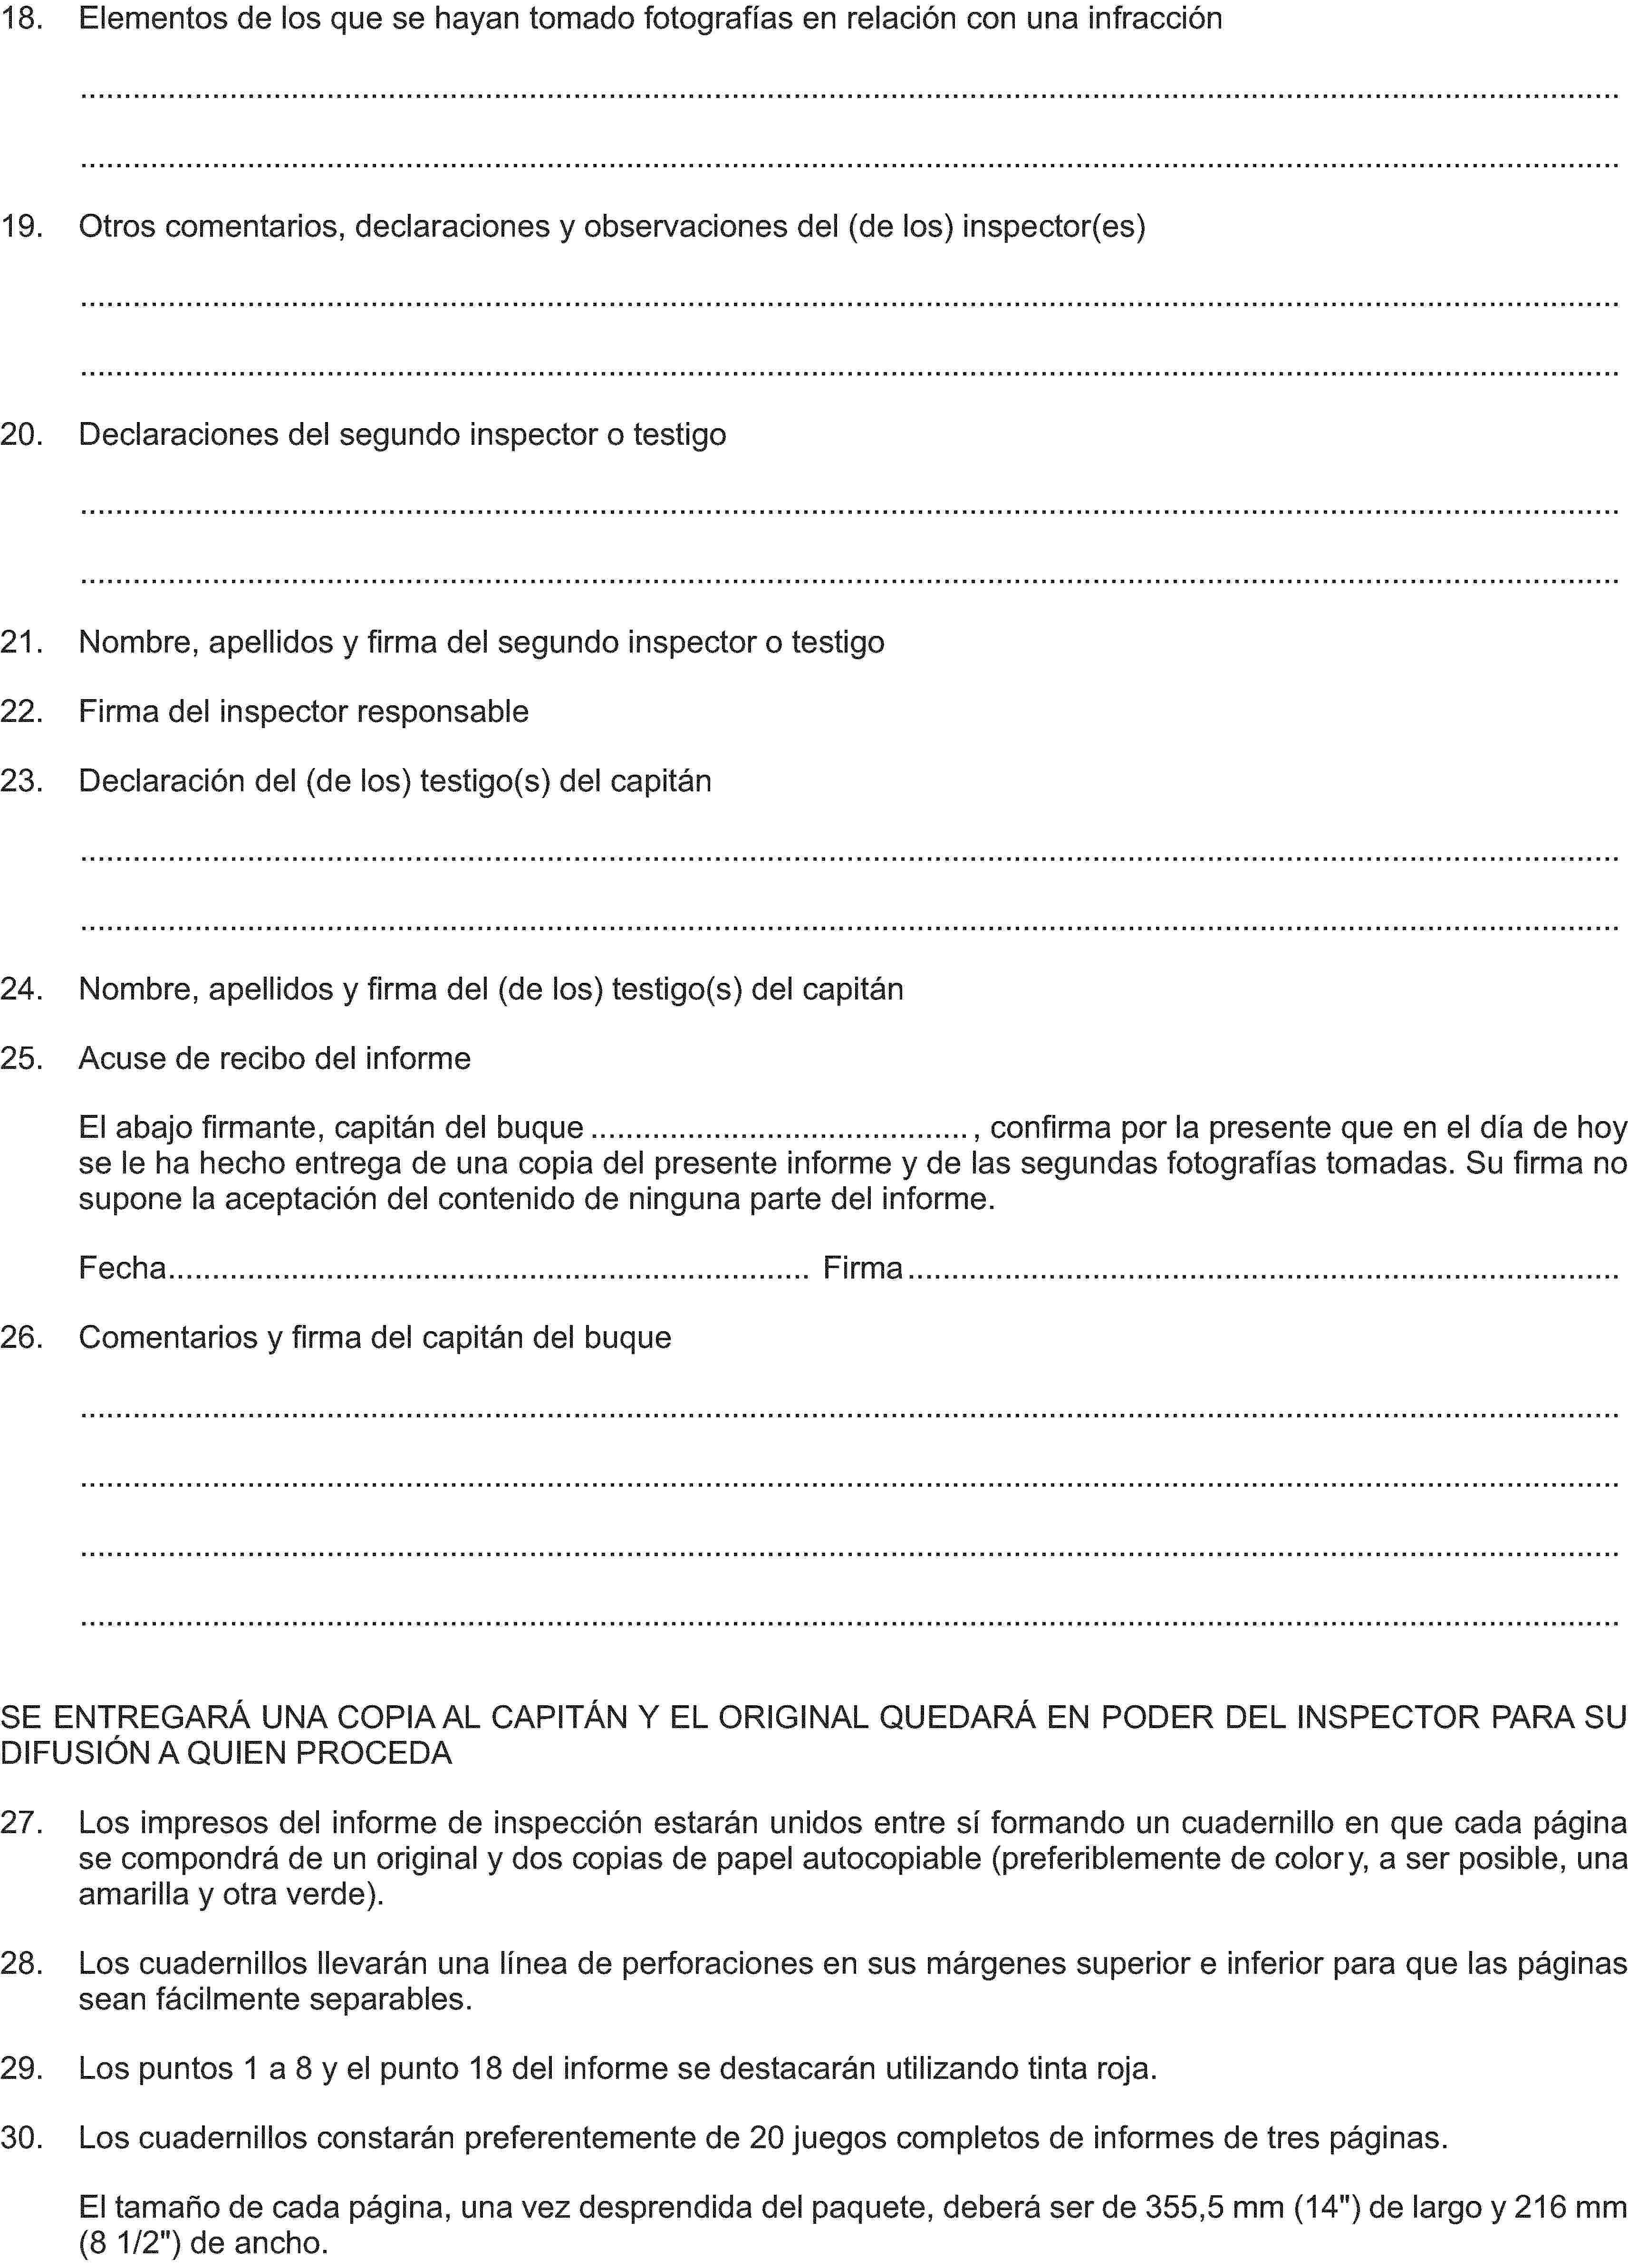 EUR-Lex - 02007R1386-20090805 - EN - EUR-Lex